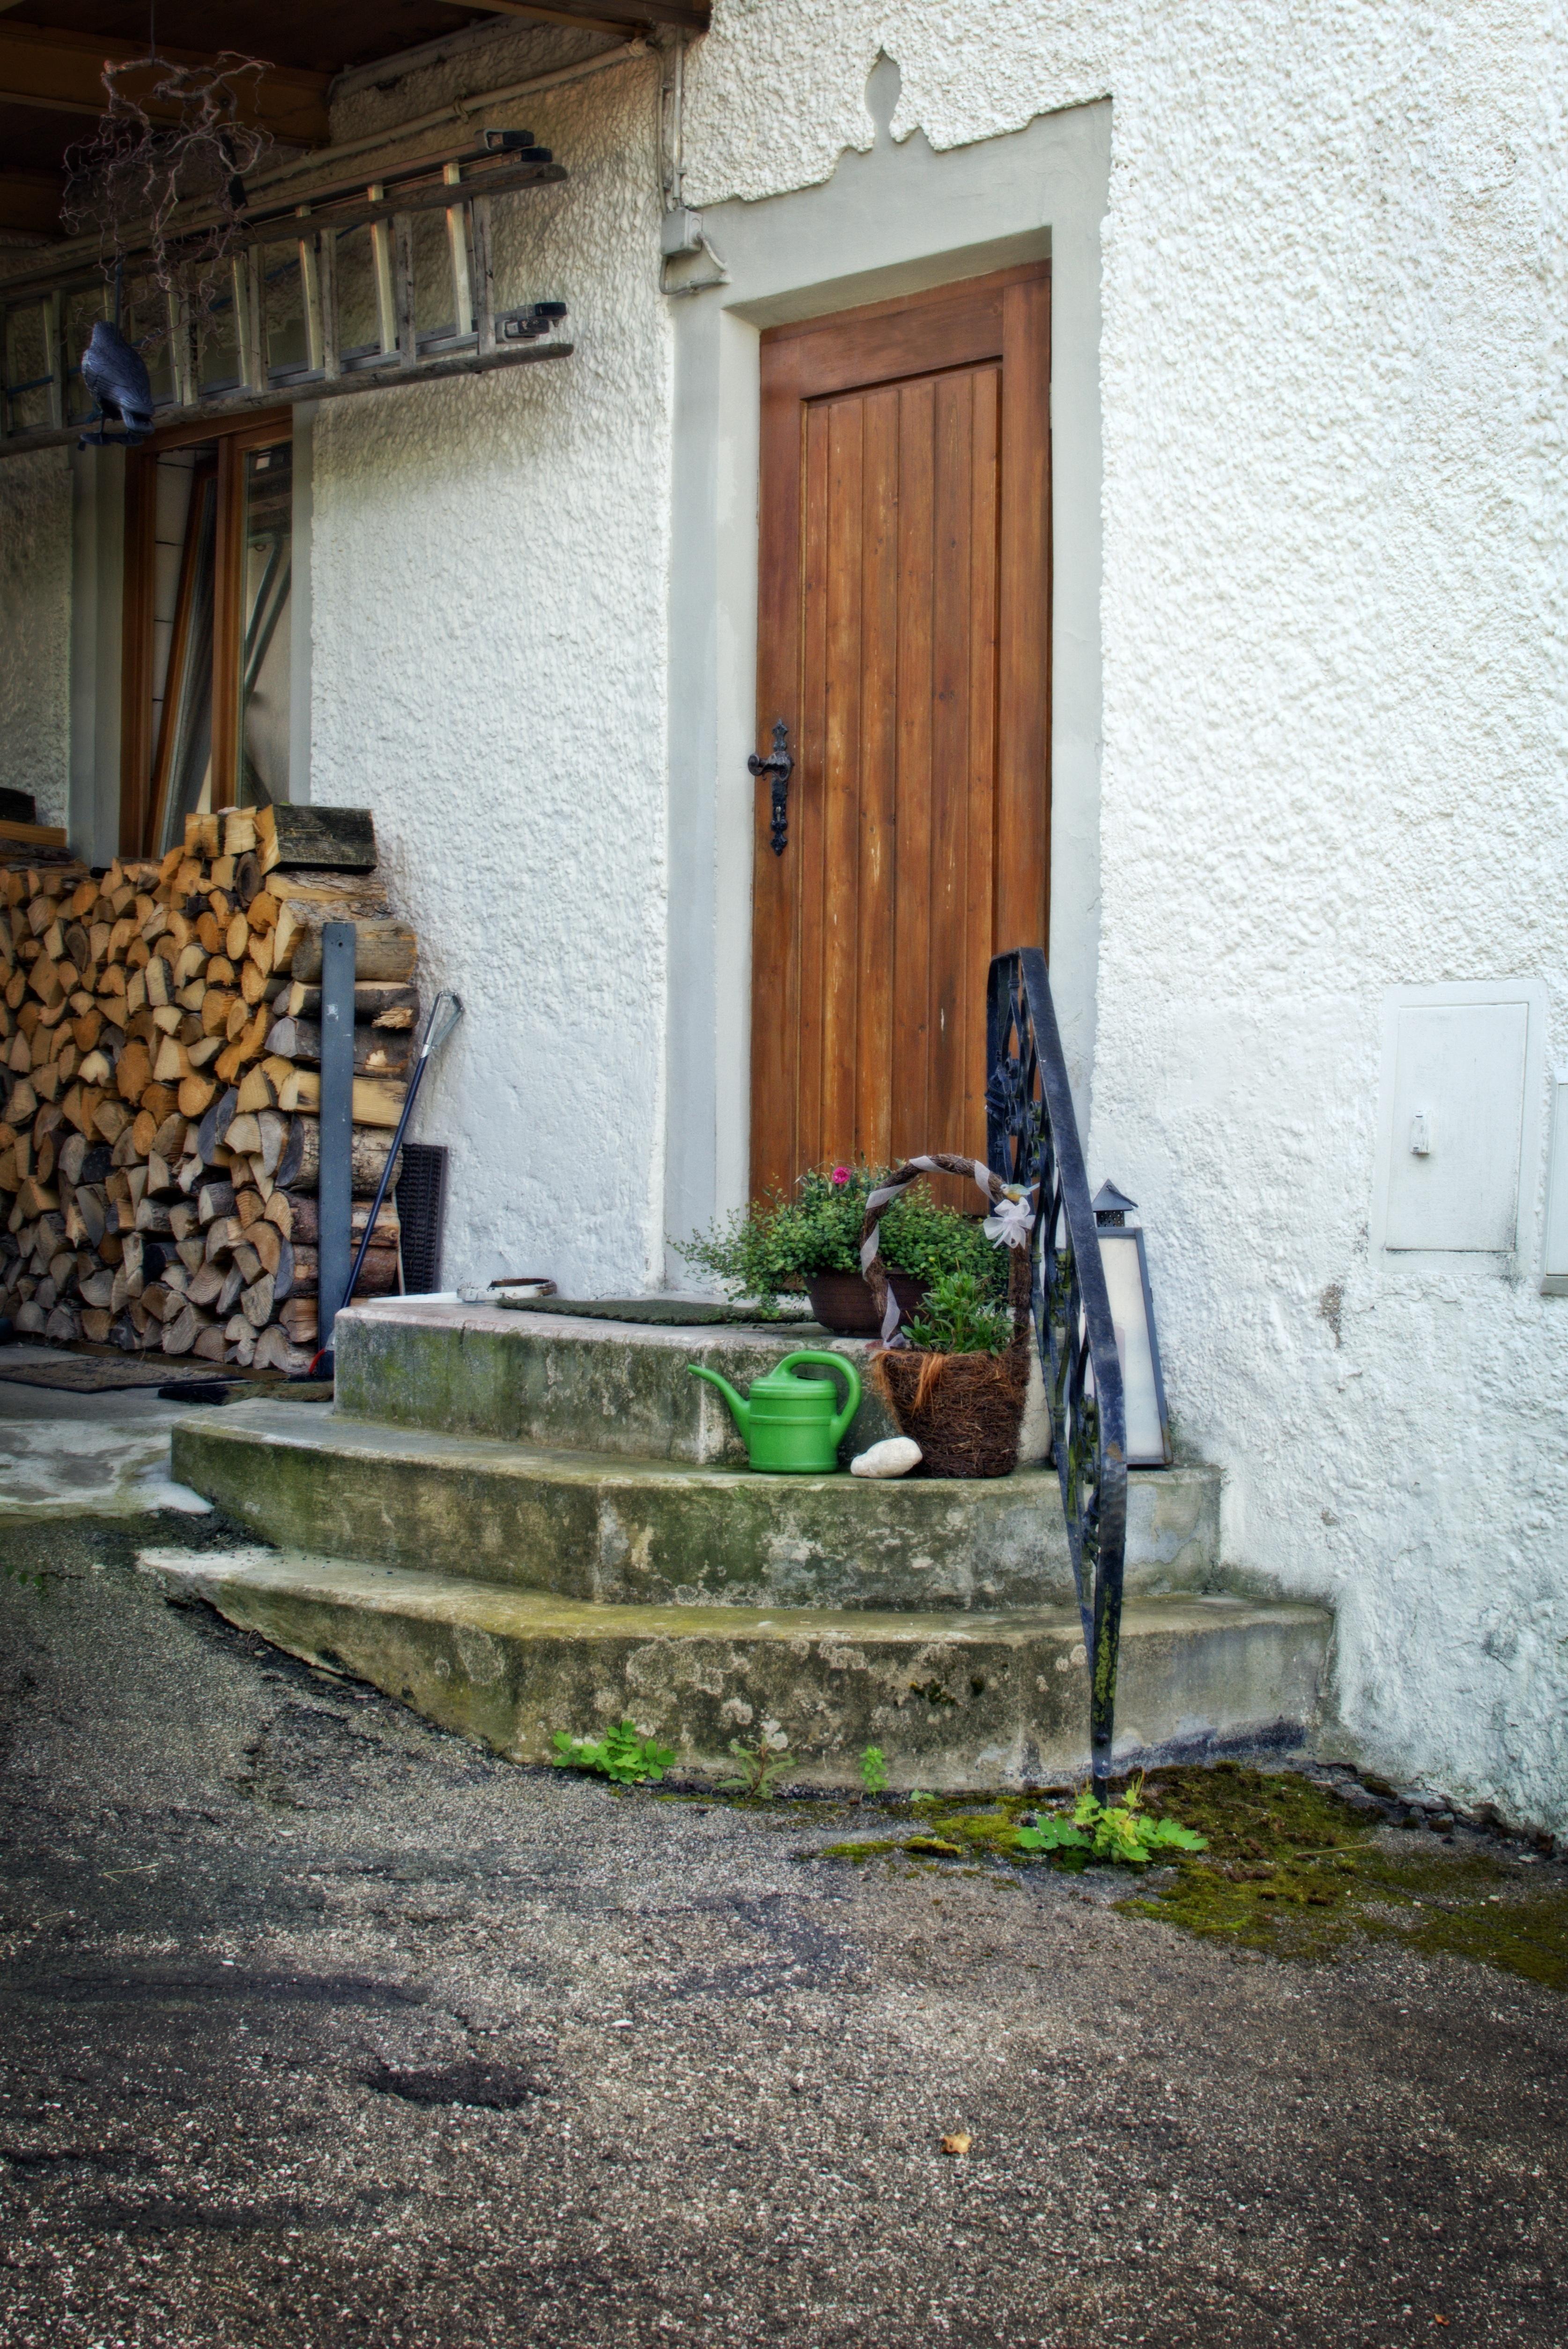 vieille porte de ferme beautiful porte intrieure pleine en chne with vieille porte de ferme. Black Bedroom Furniture Sets. Home Design Ideas